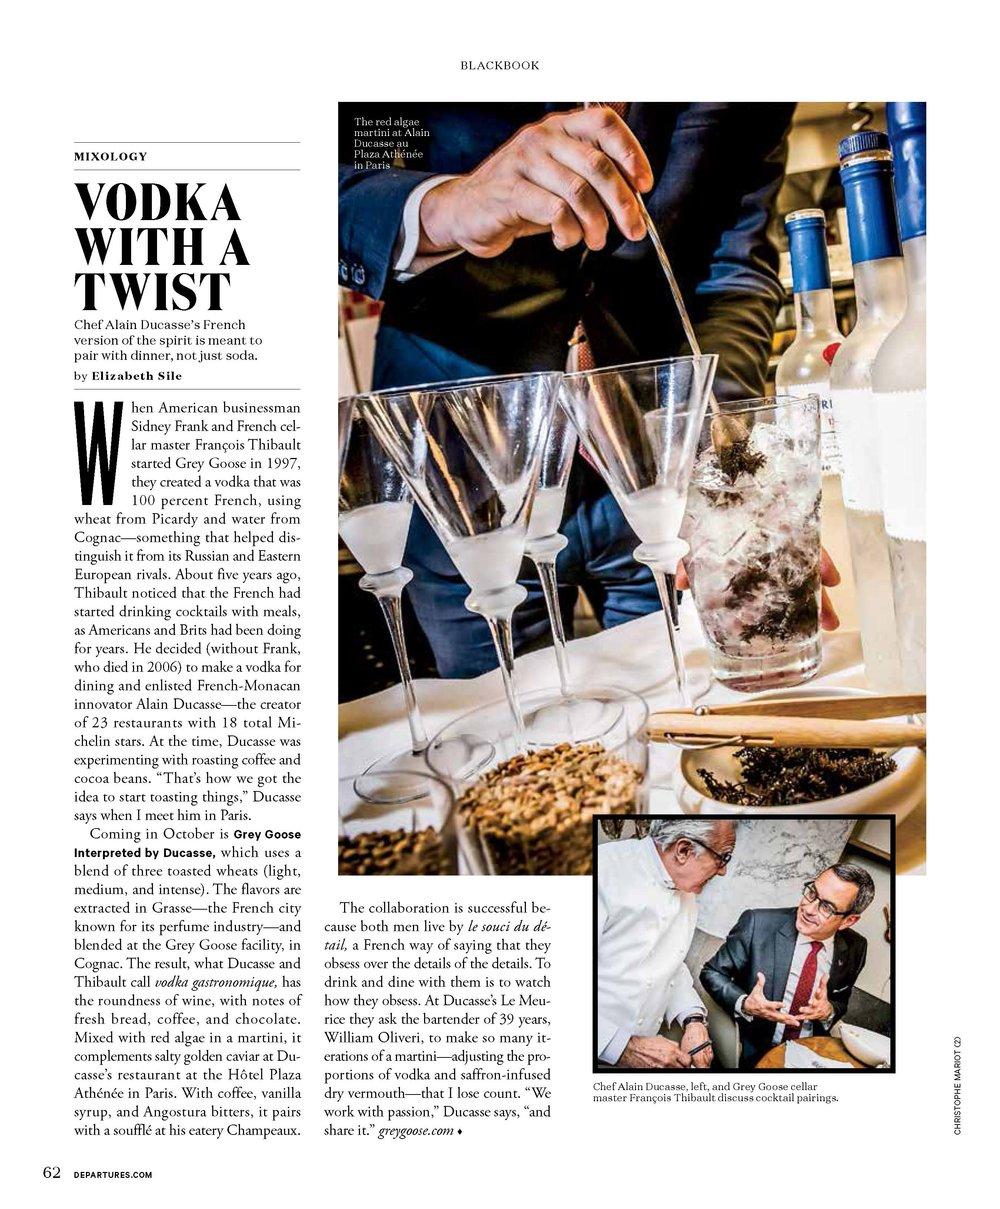 062_0917_DP-BB-Vodka.LO.jpg